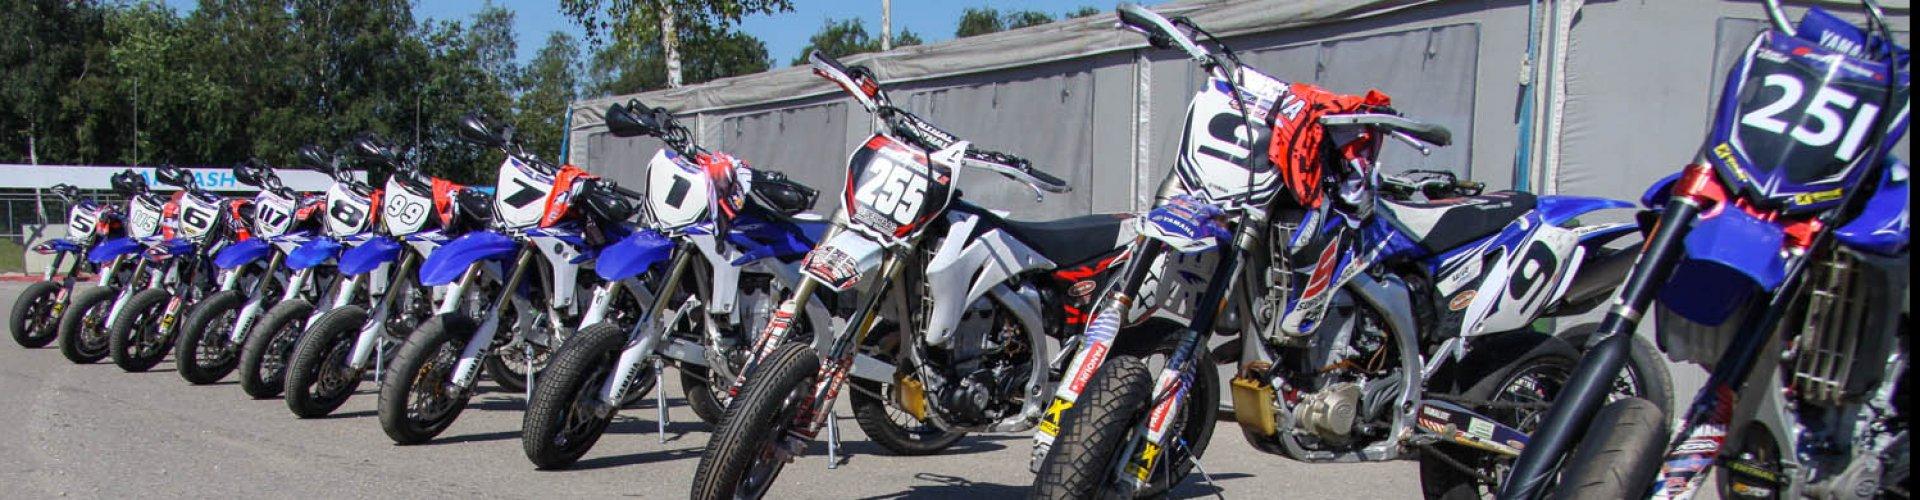 Yamaha WR450 Supermotorschool Motoren